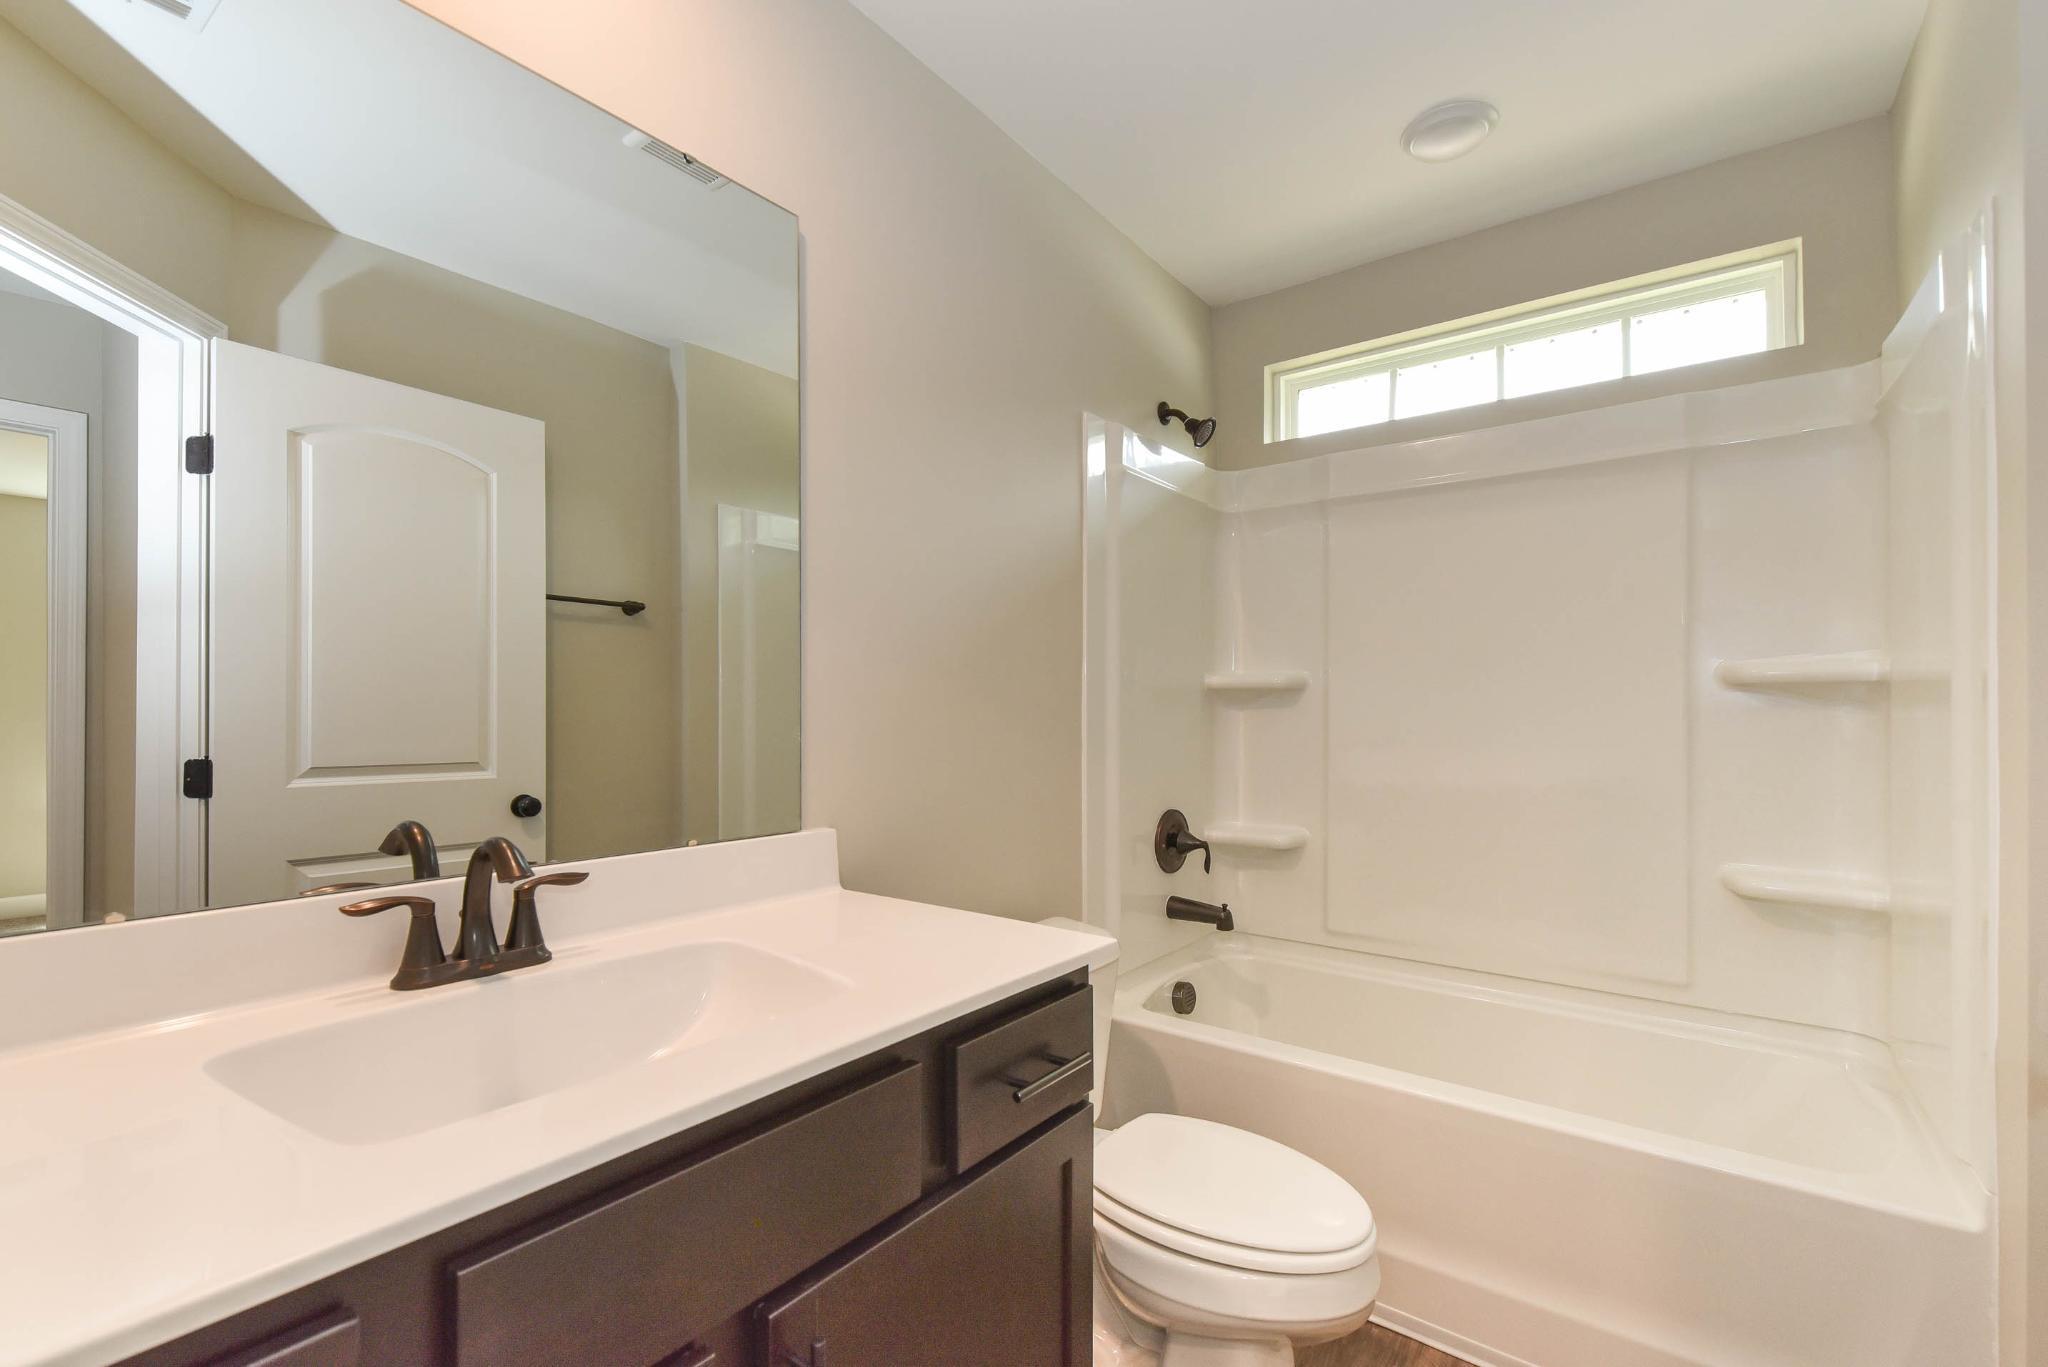 Bathroom featured in the Daufuski By Ernest Homes in Savannah, GA